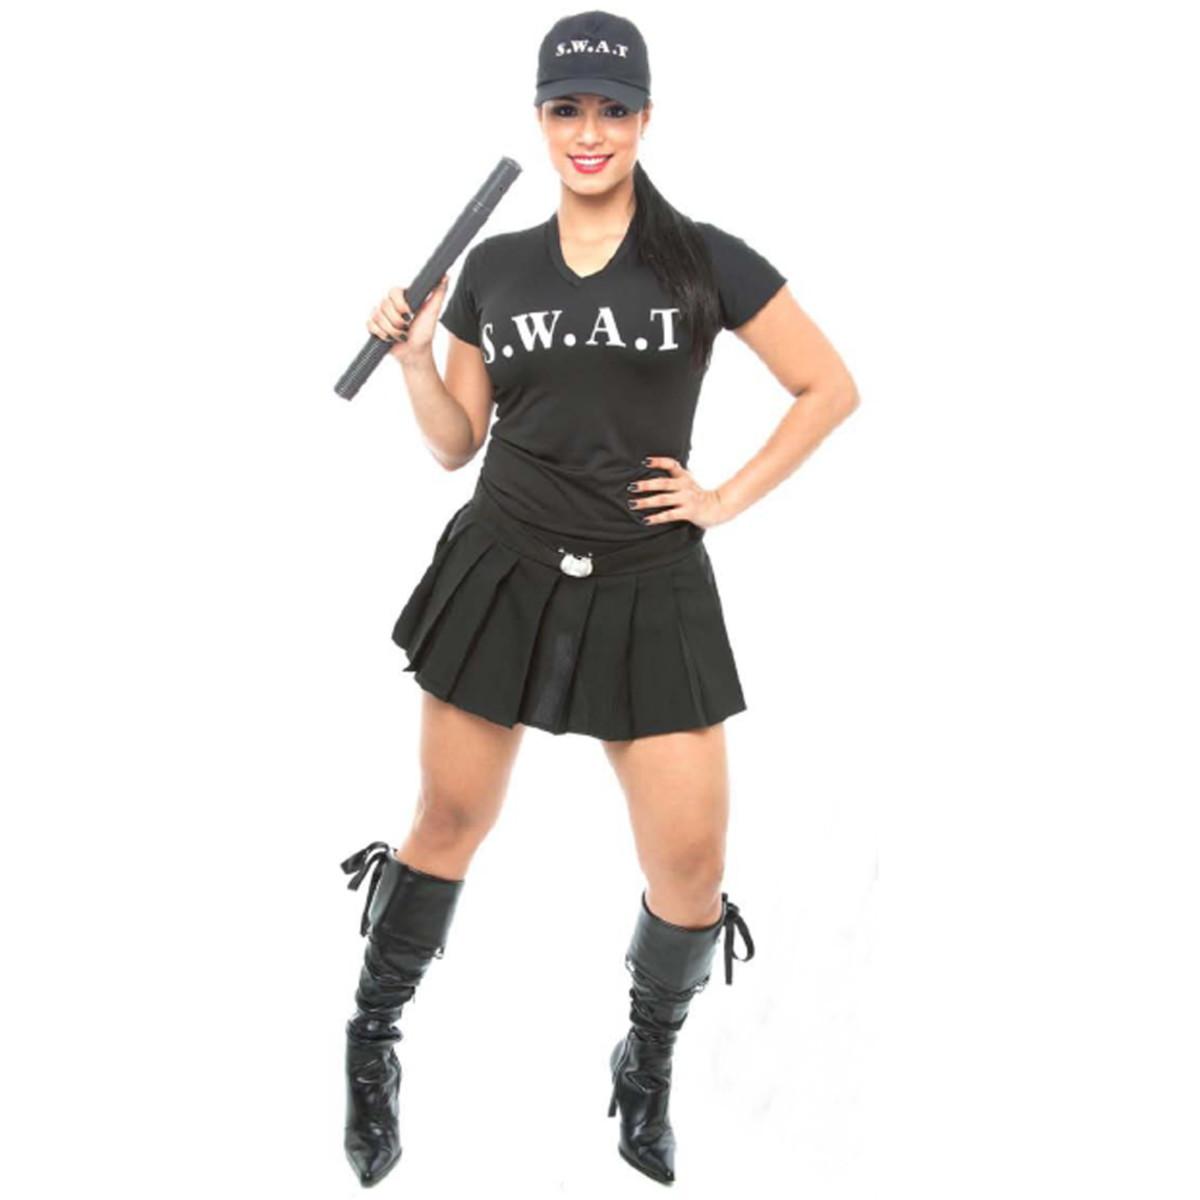 554db5a78 Fantasia Policial Swat Sexy Feminina Carnaval no Elo7